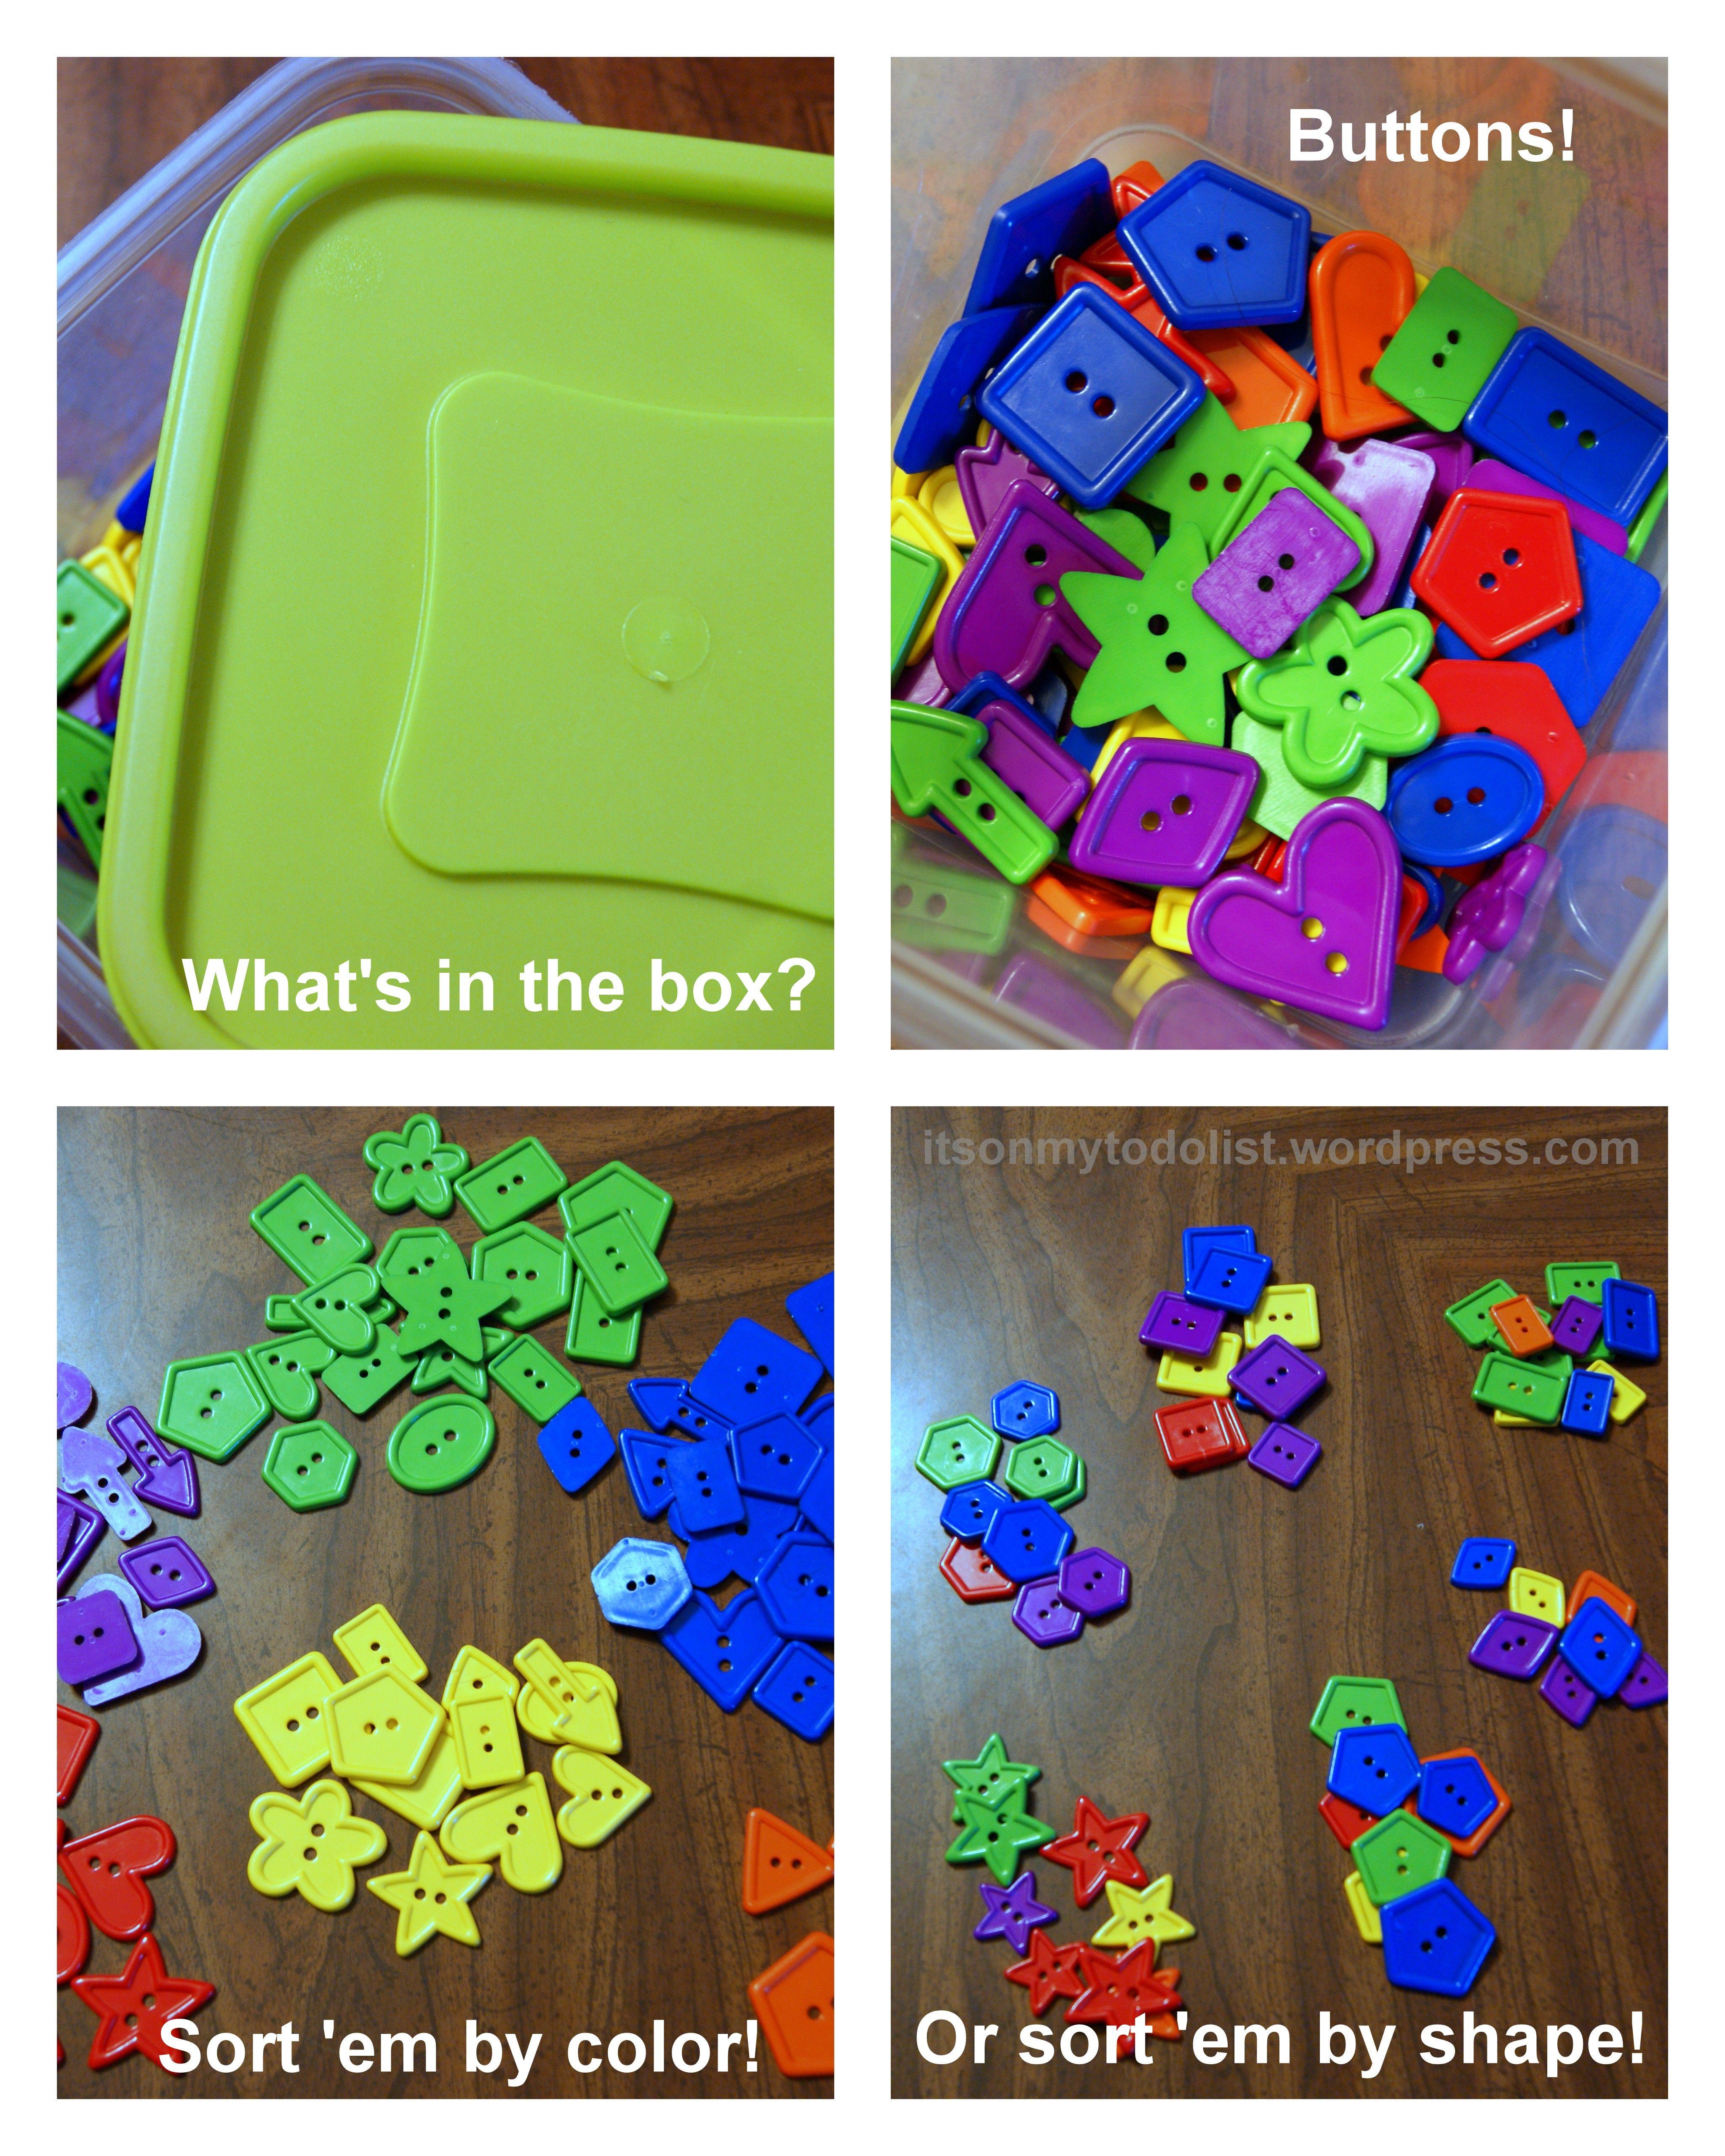 Sorting Buttons Worksheet For Kindergarten